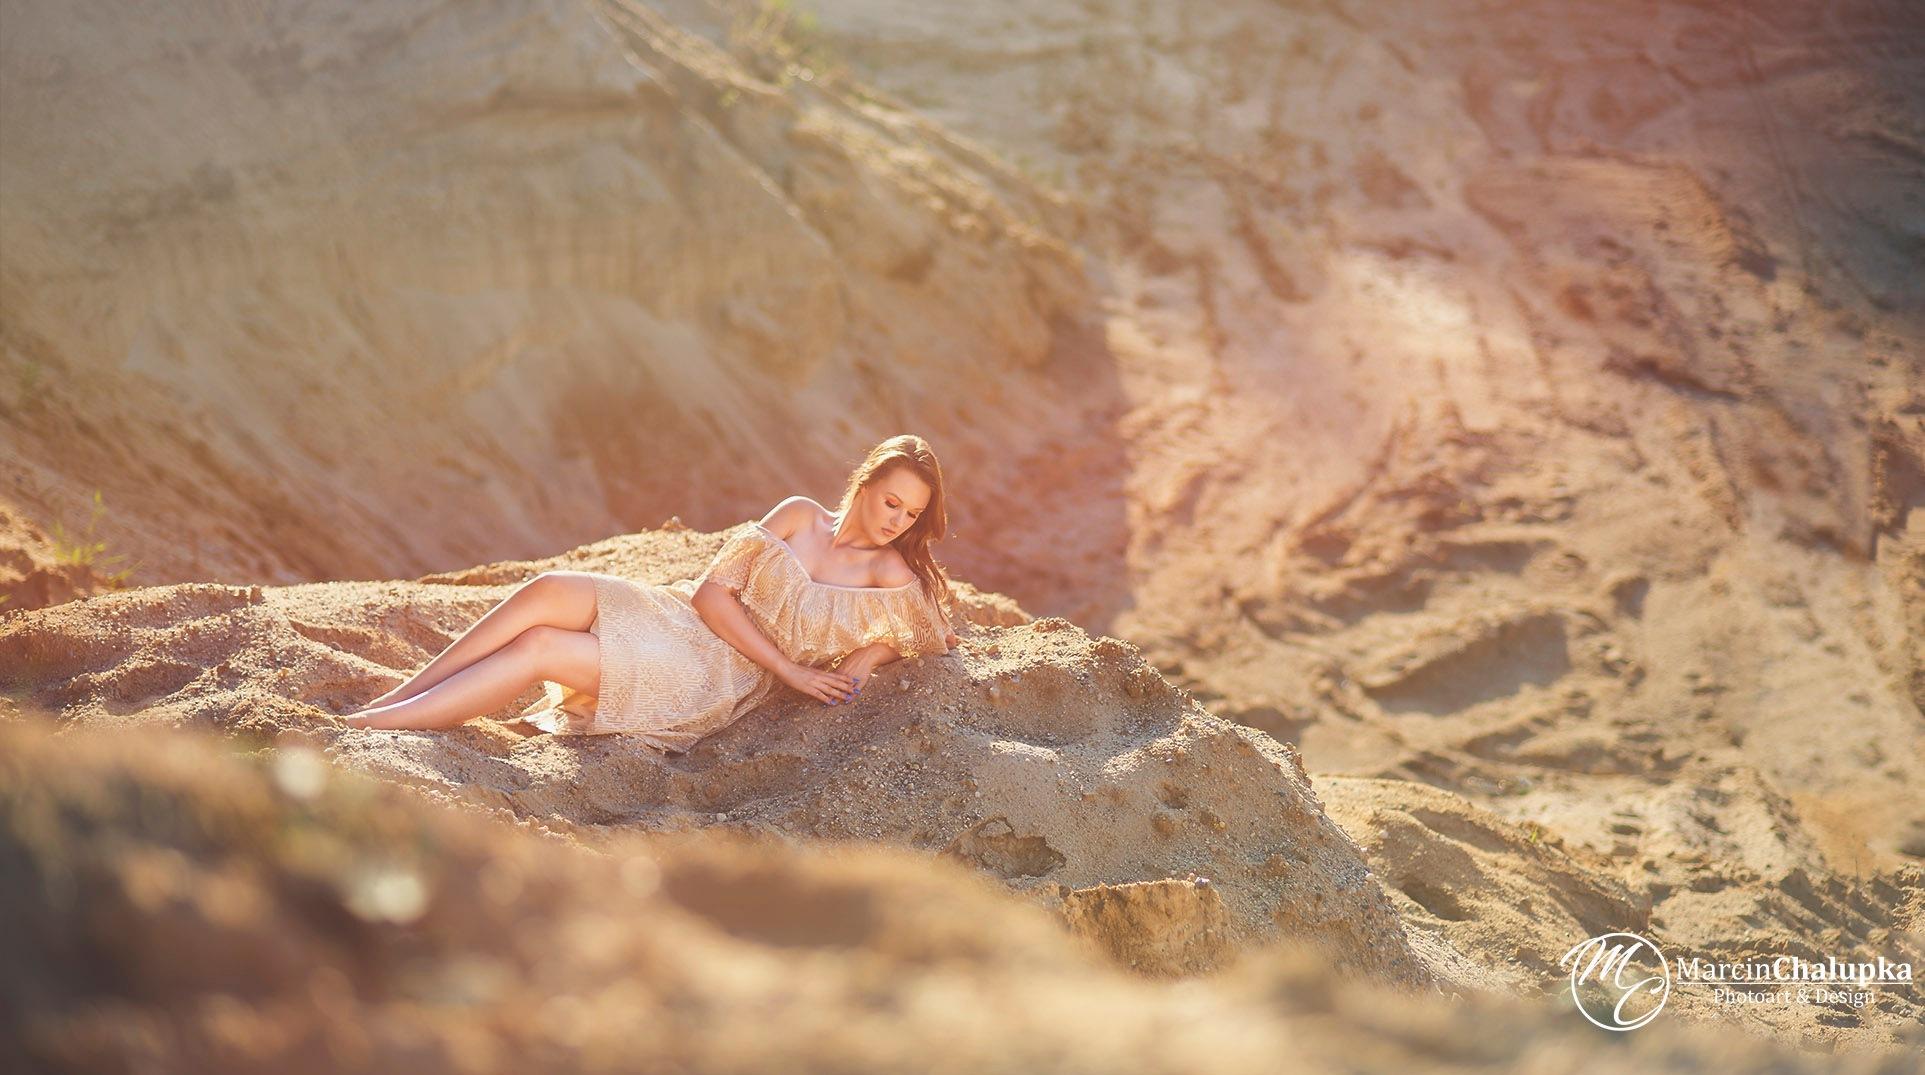 Sunny Day by MarcinChalupkaPhotography